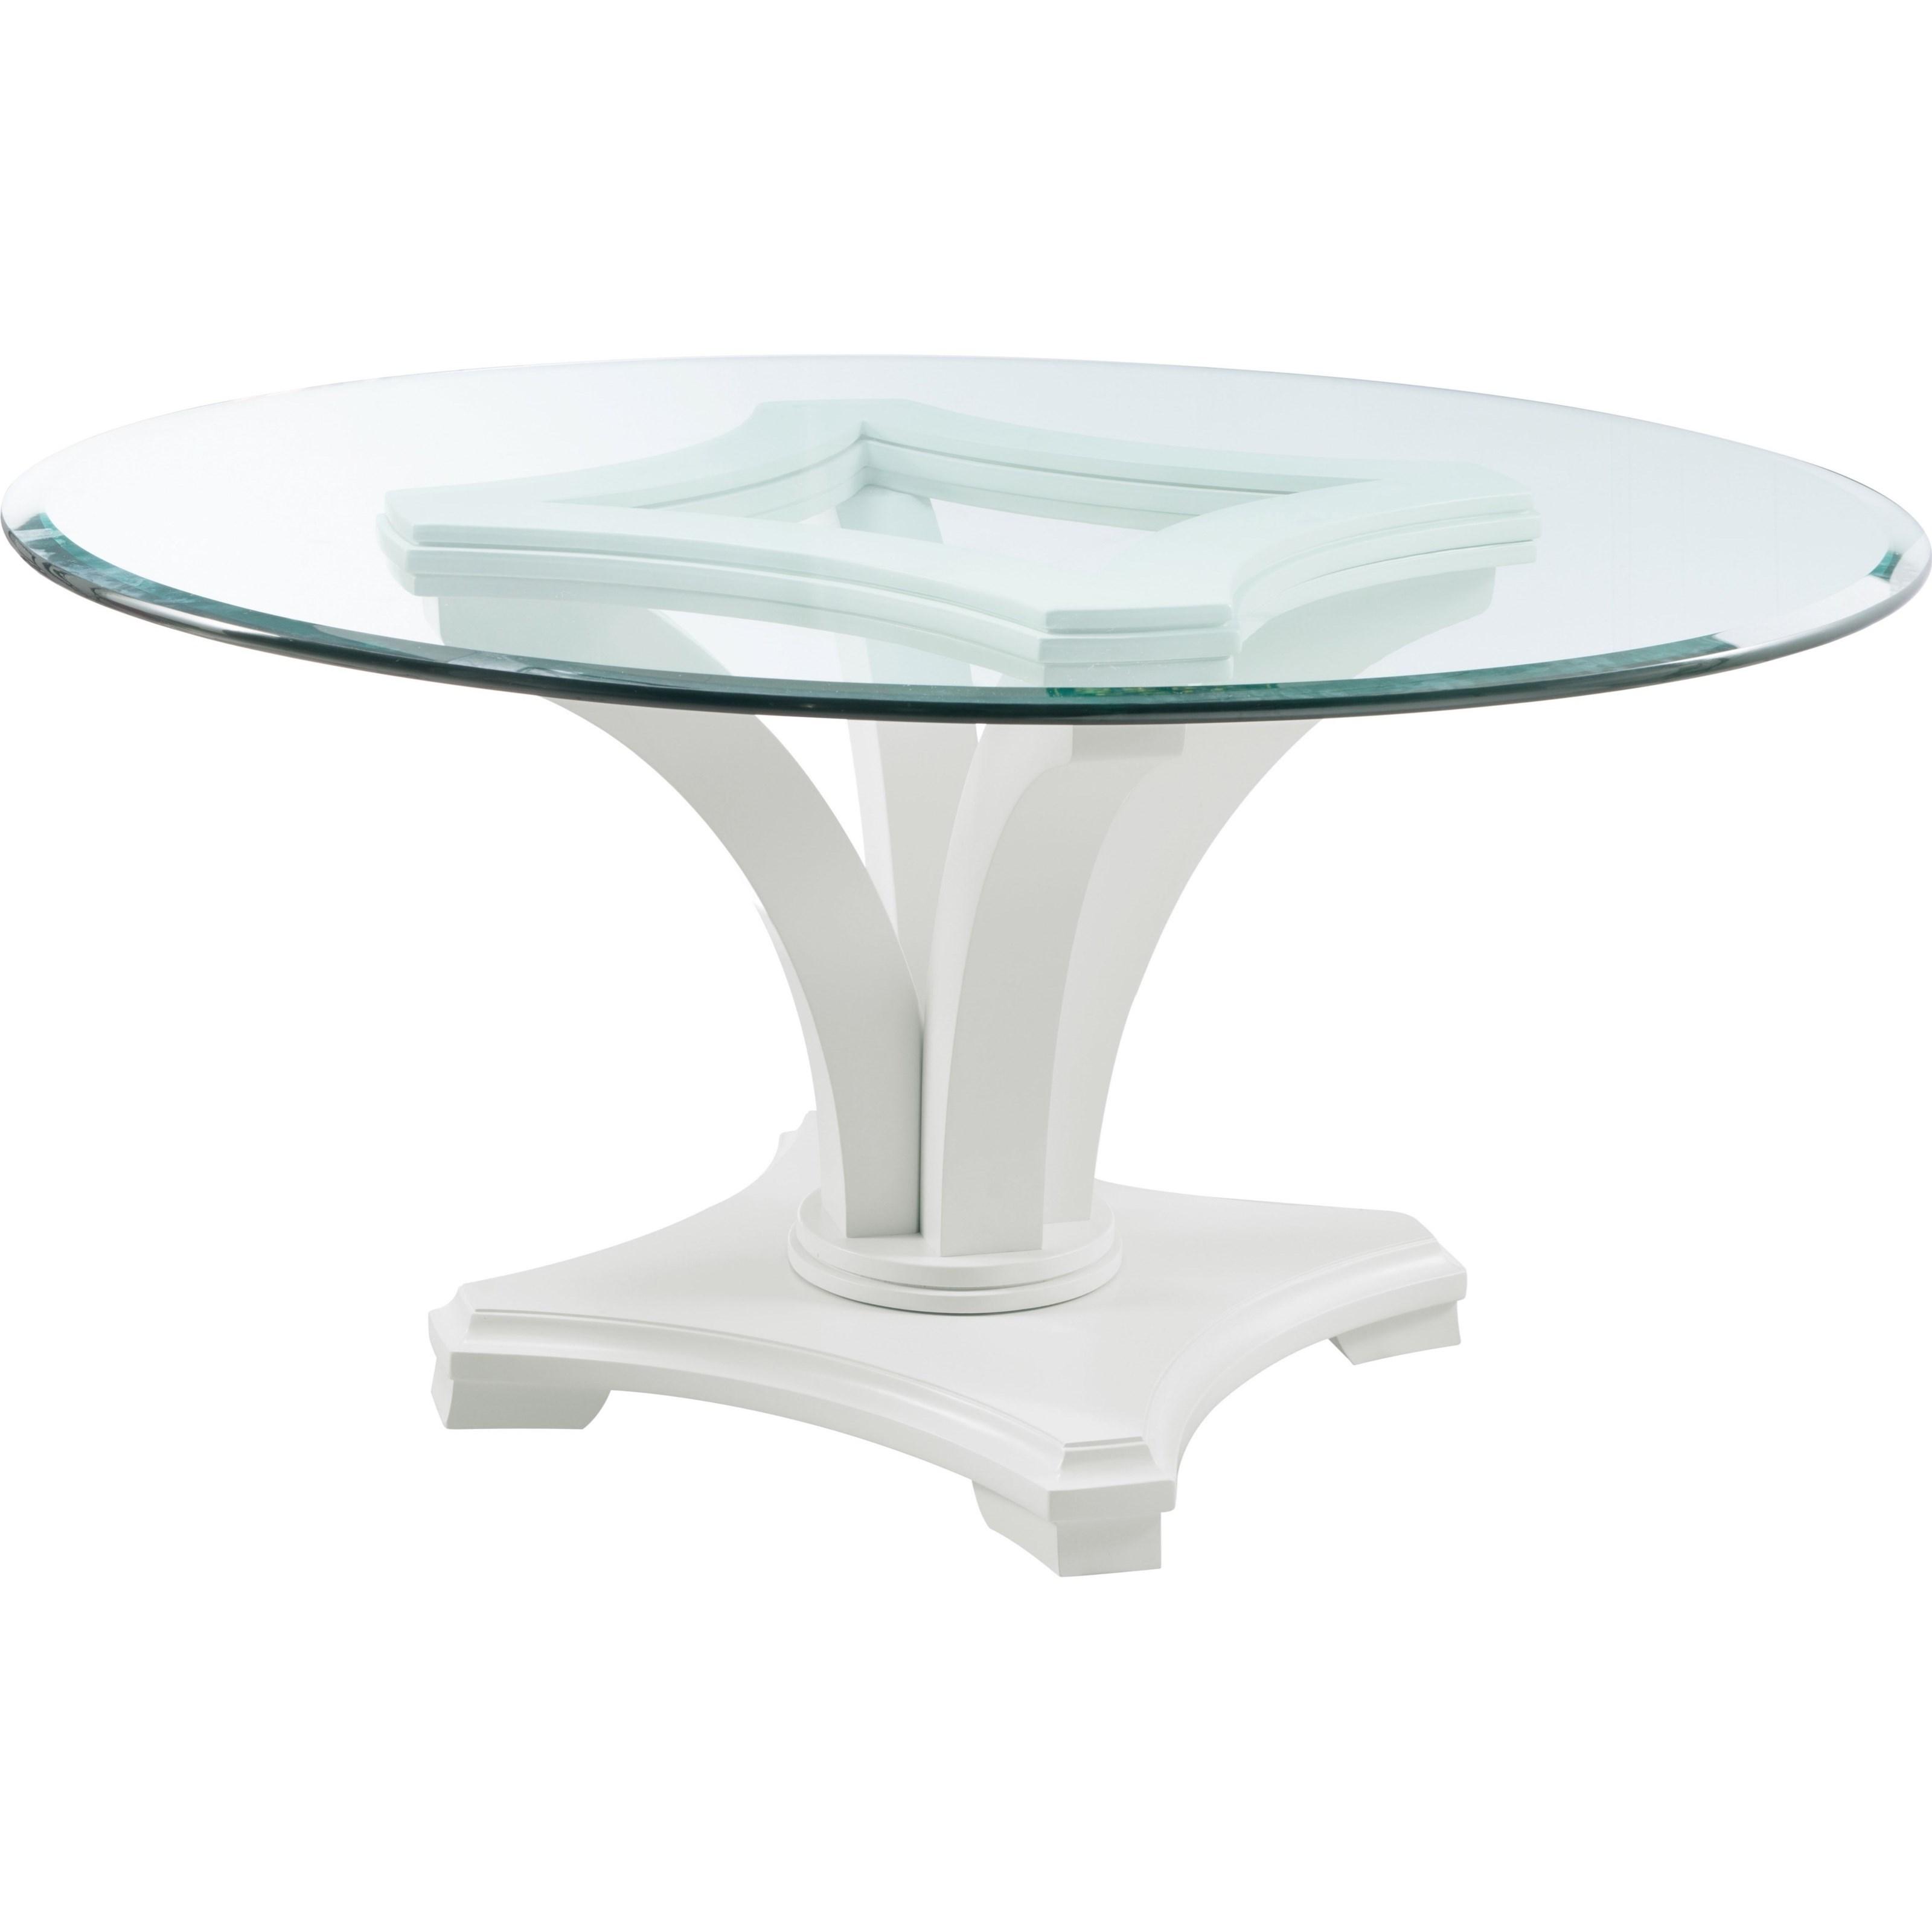 Thomasville® Manuscript Round Dining Table - Item Number: 82925-730